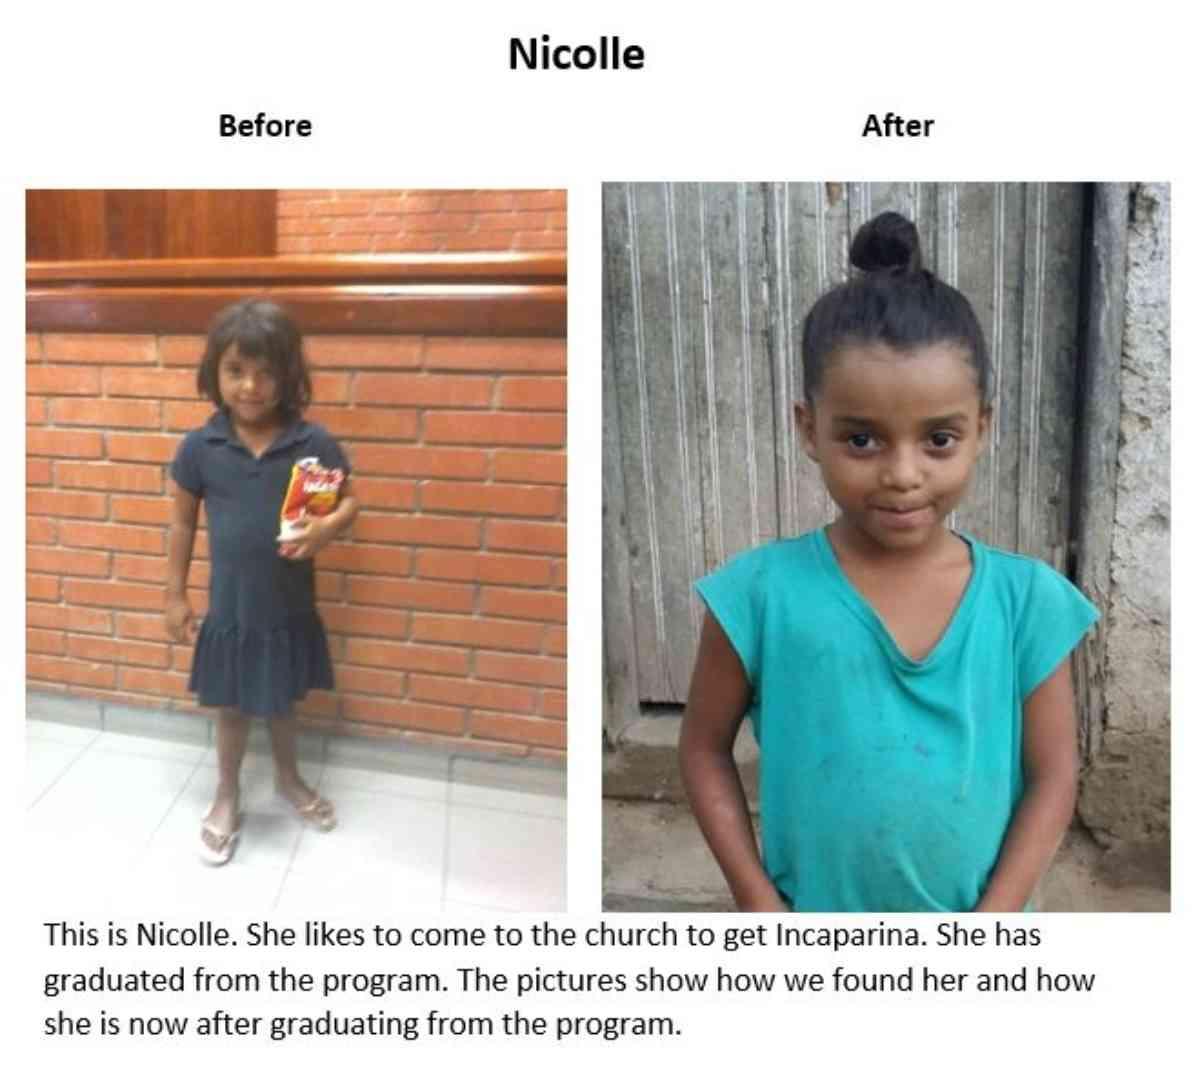 Danli 10 2016 Nicolle